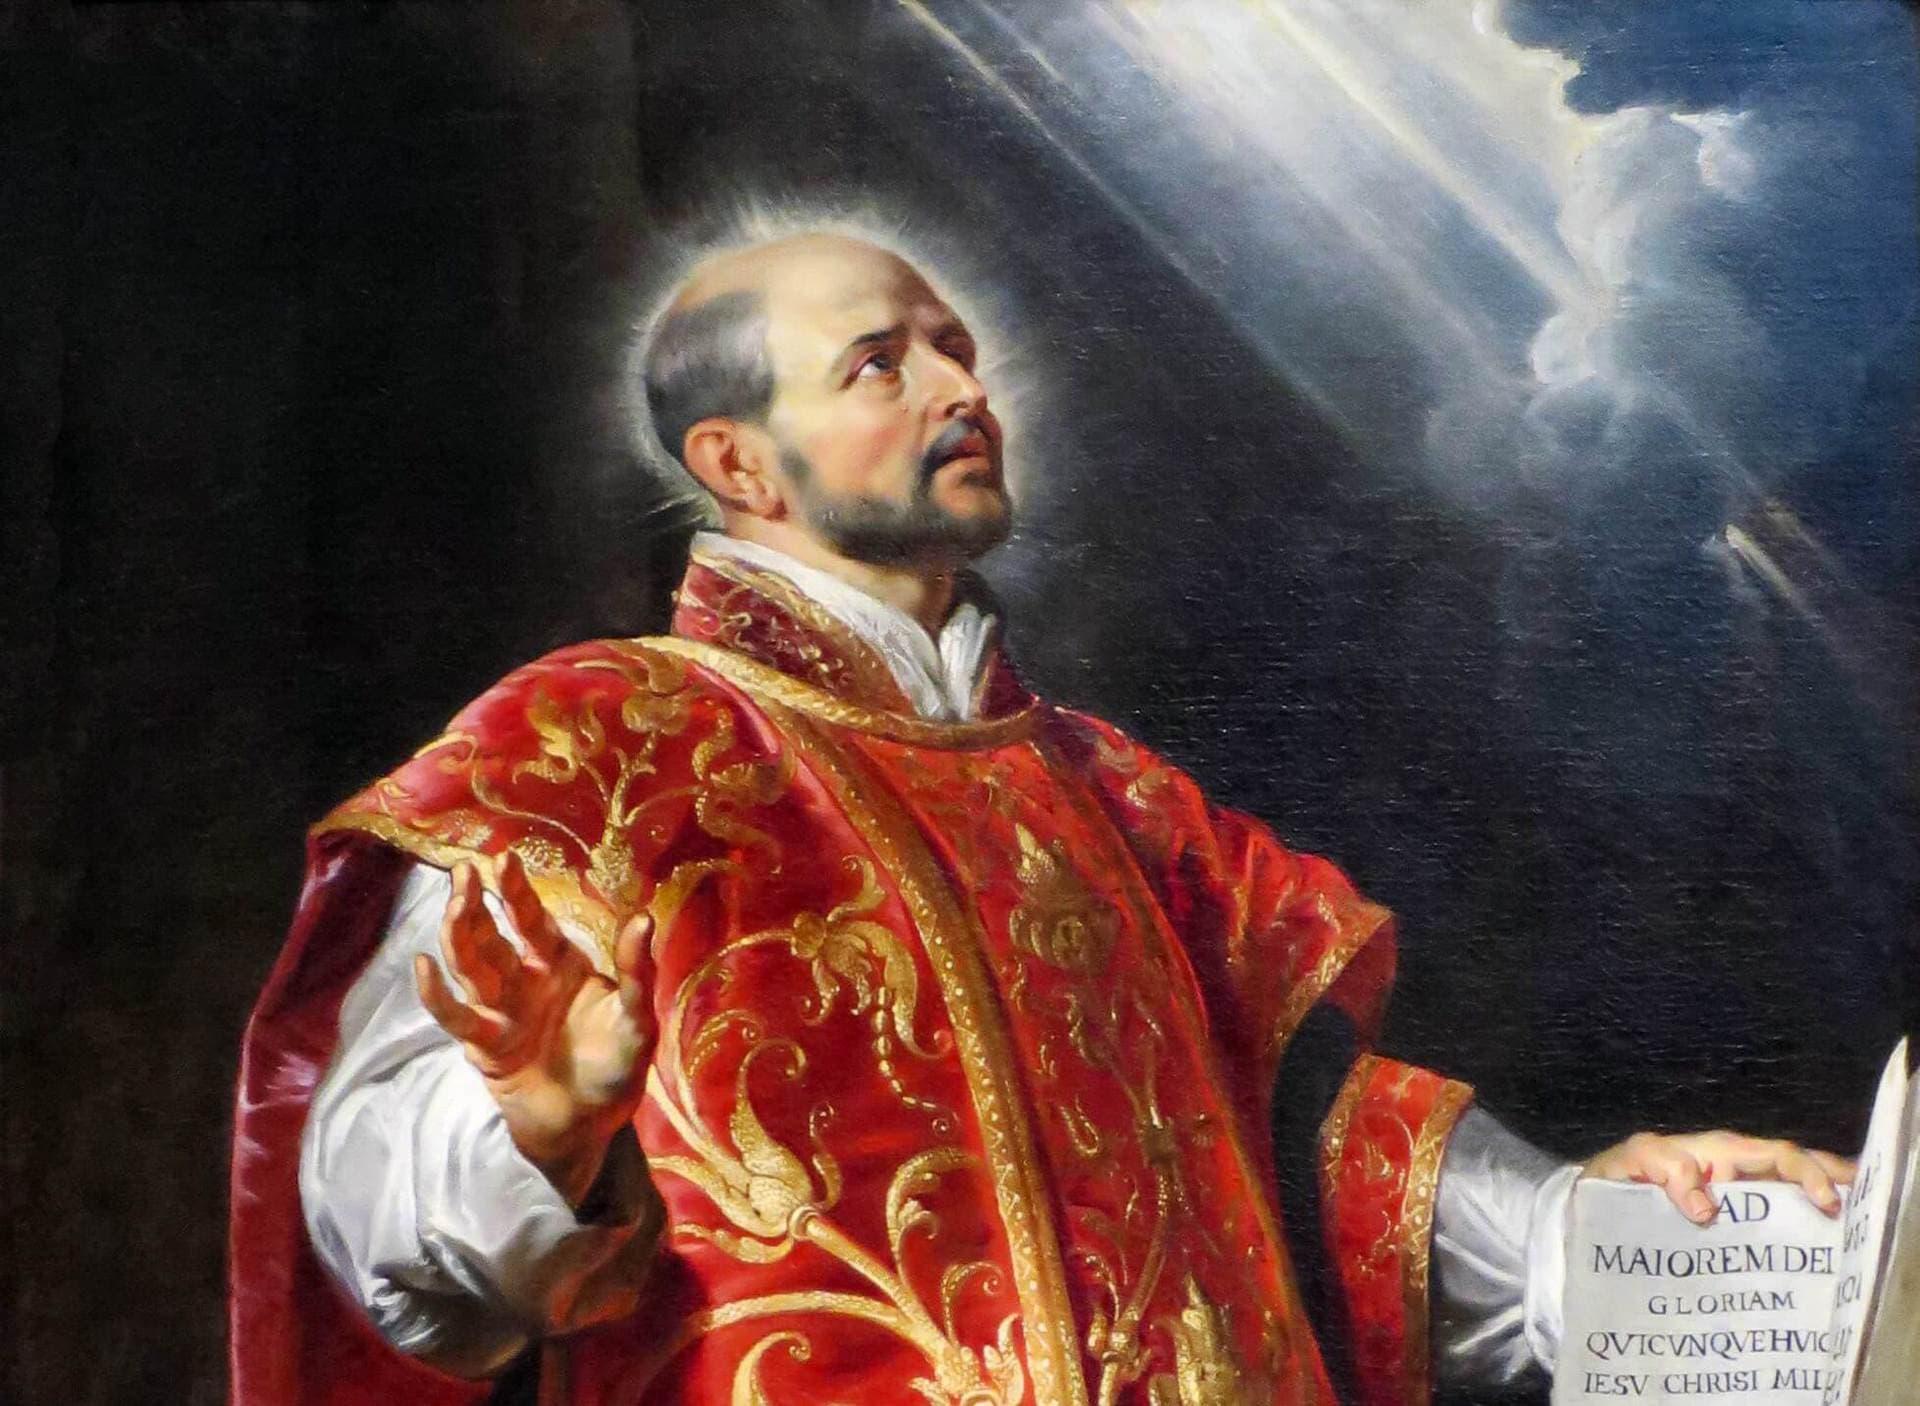 st. ignatius of loyola 3 steps to contemplative prayer